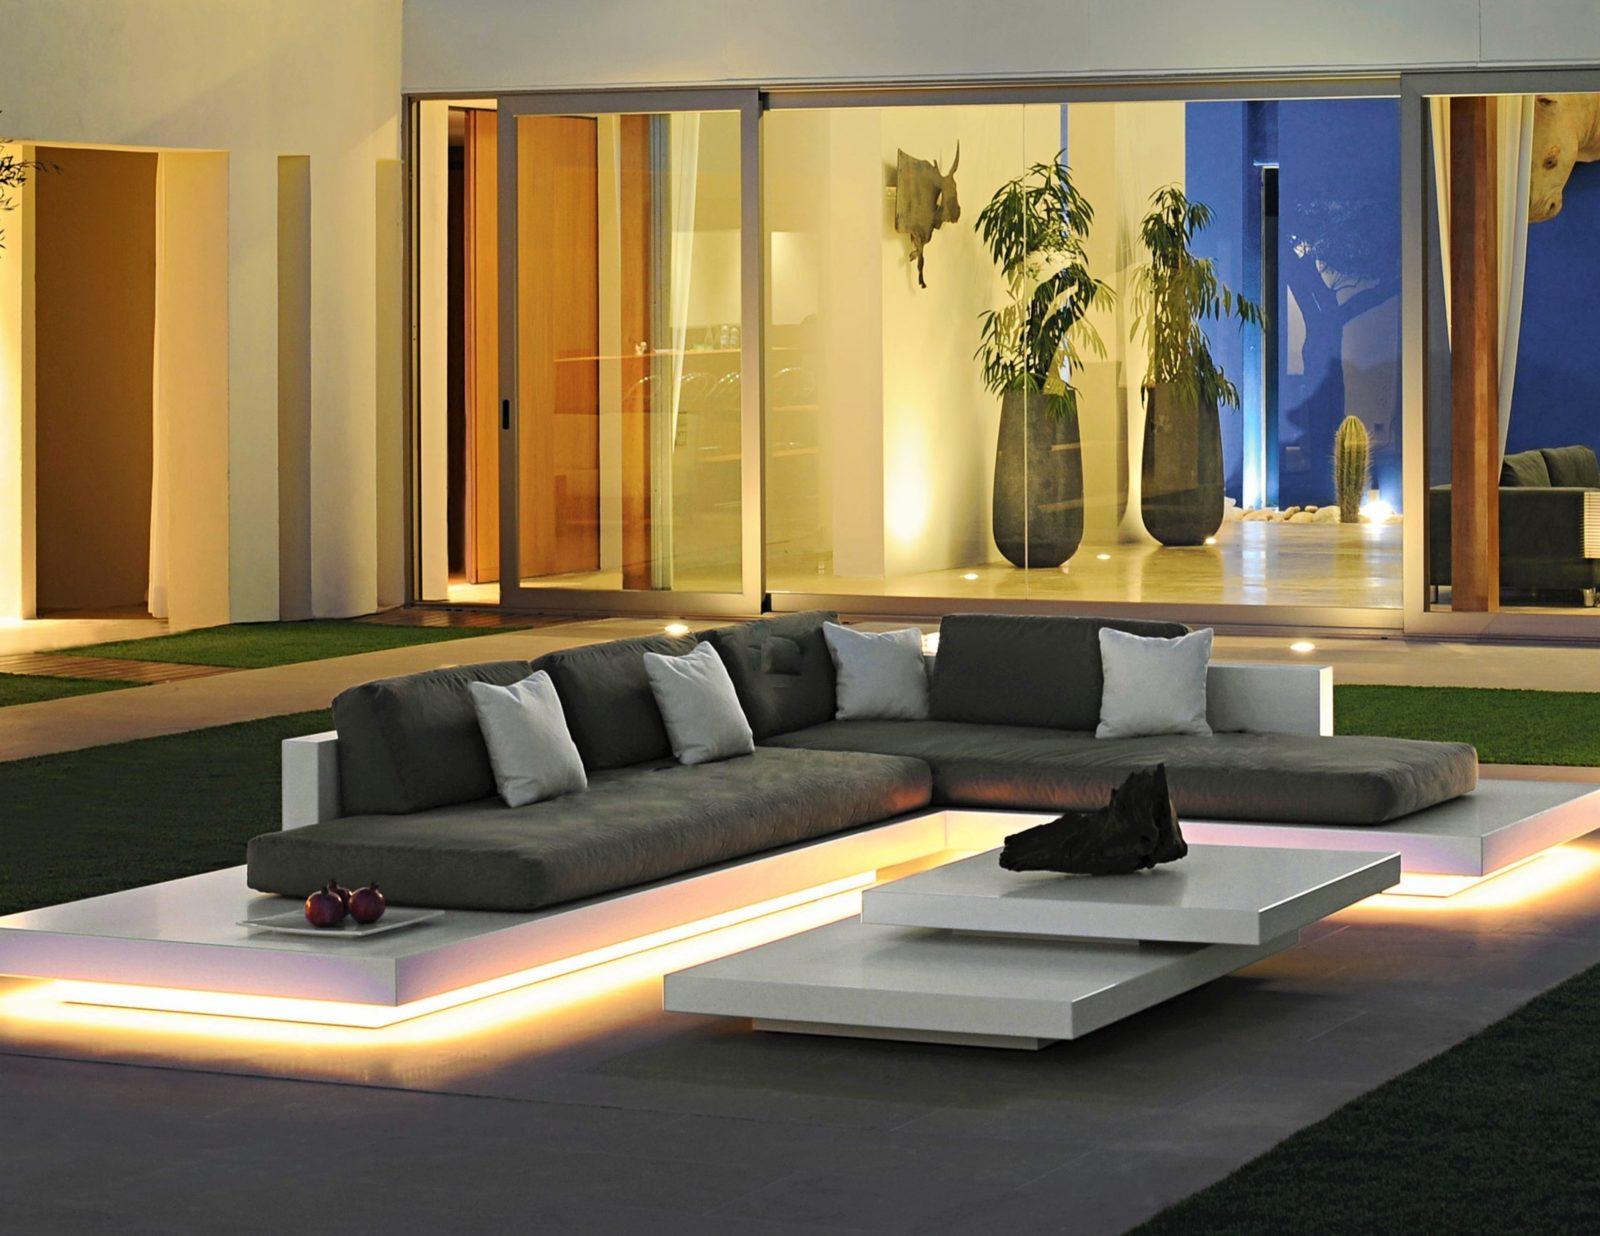 Air Platform Modular Sectional Sofa Led Lights By Rausch